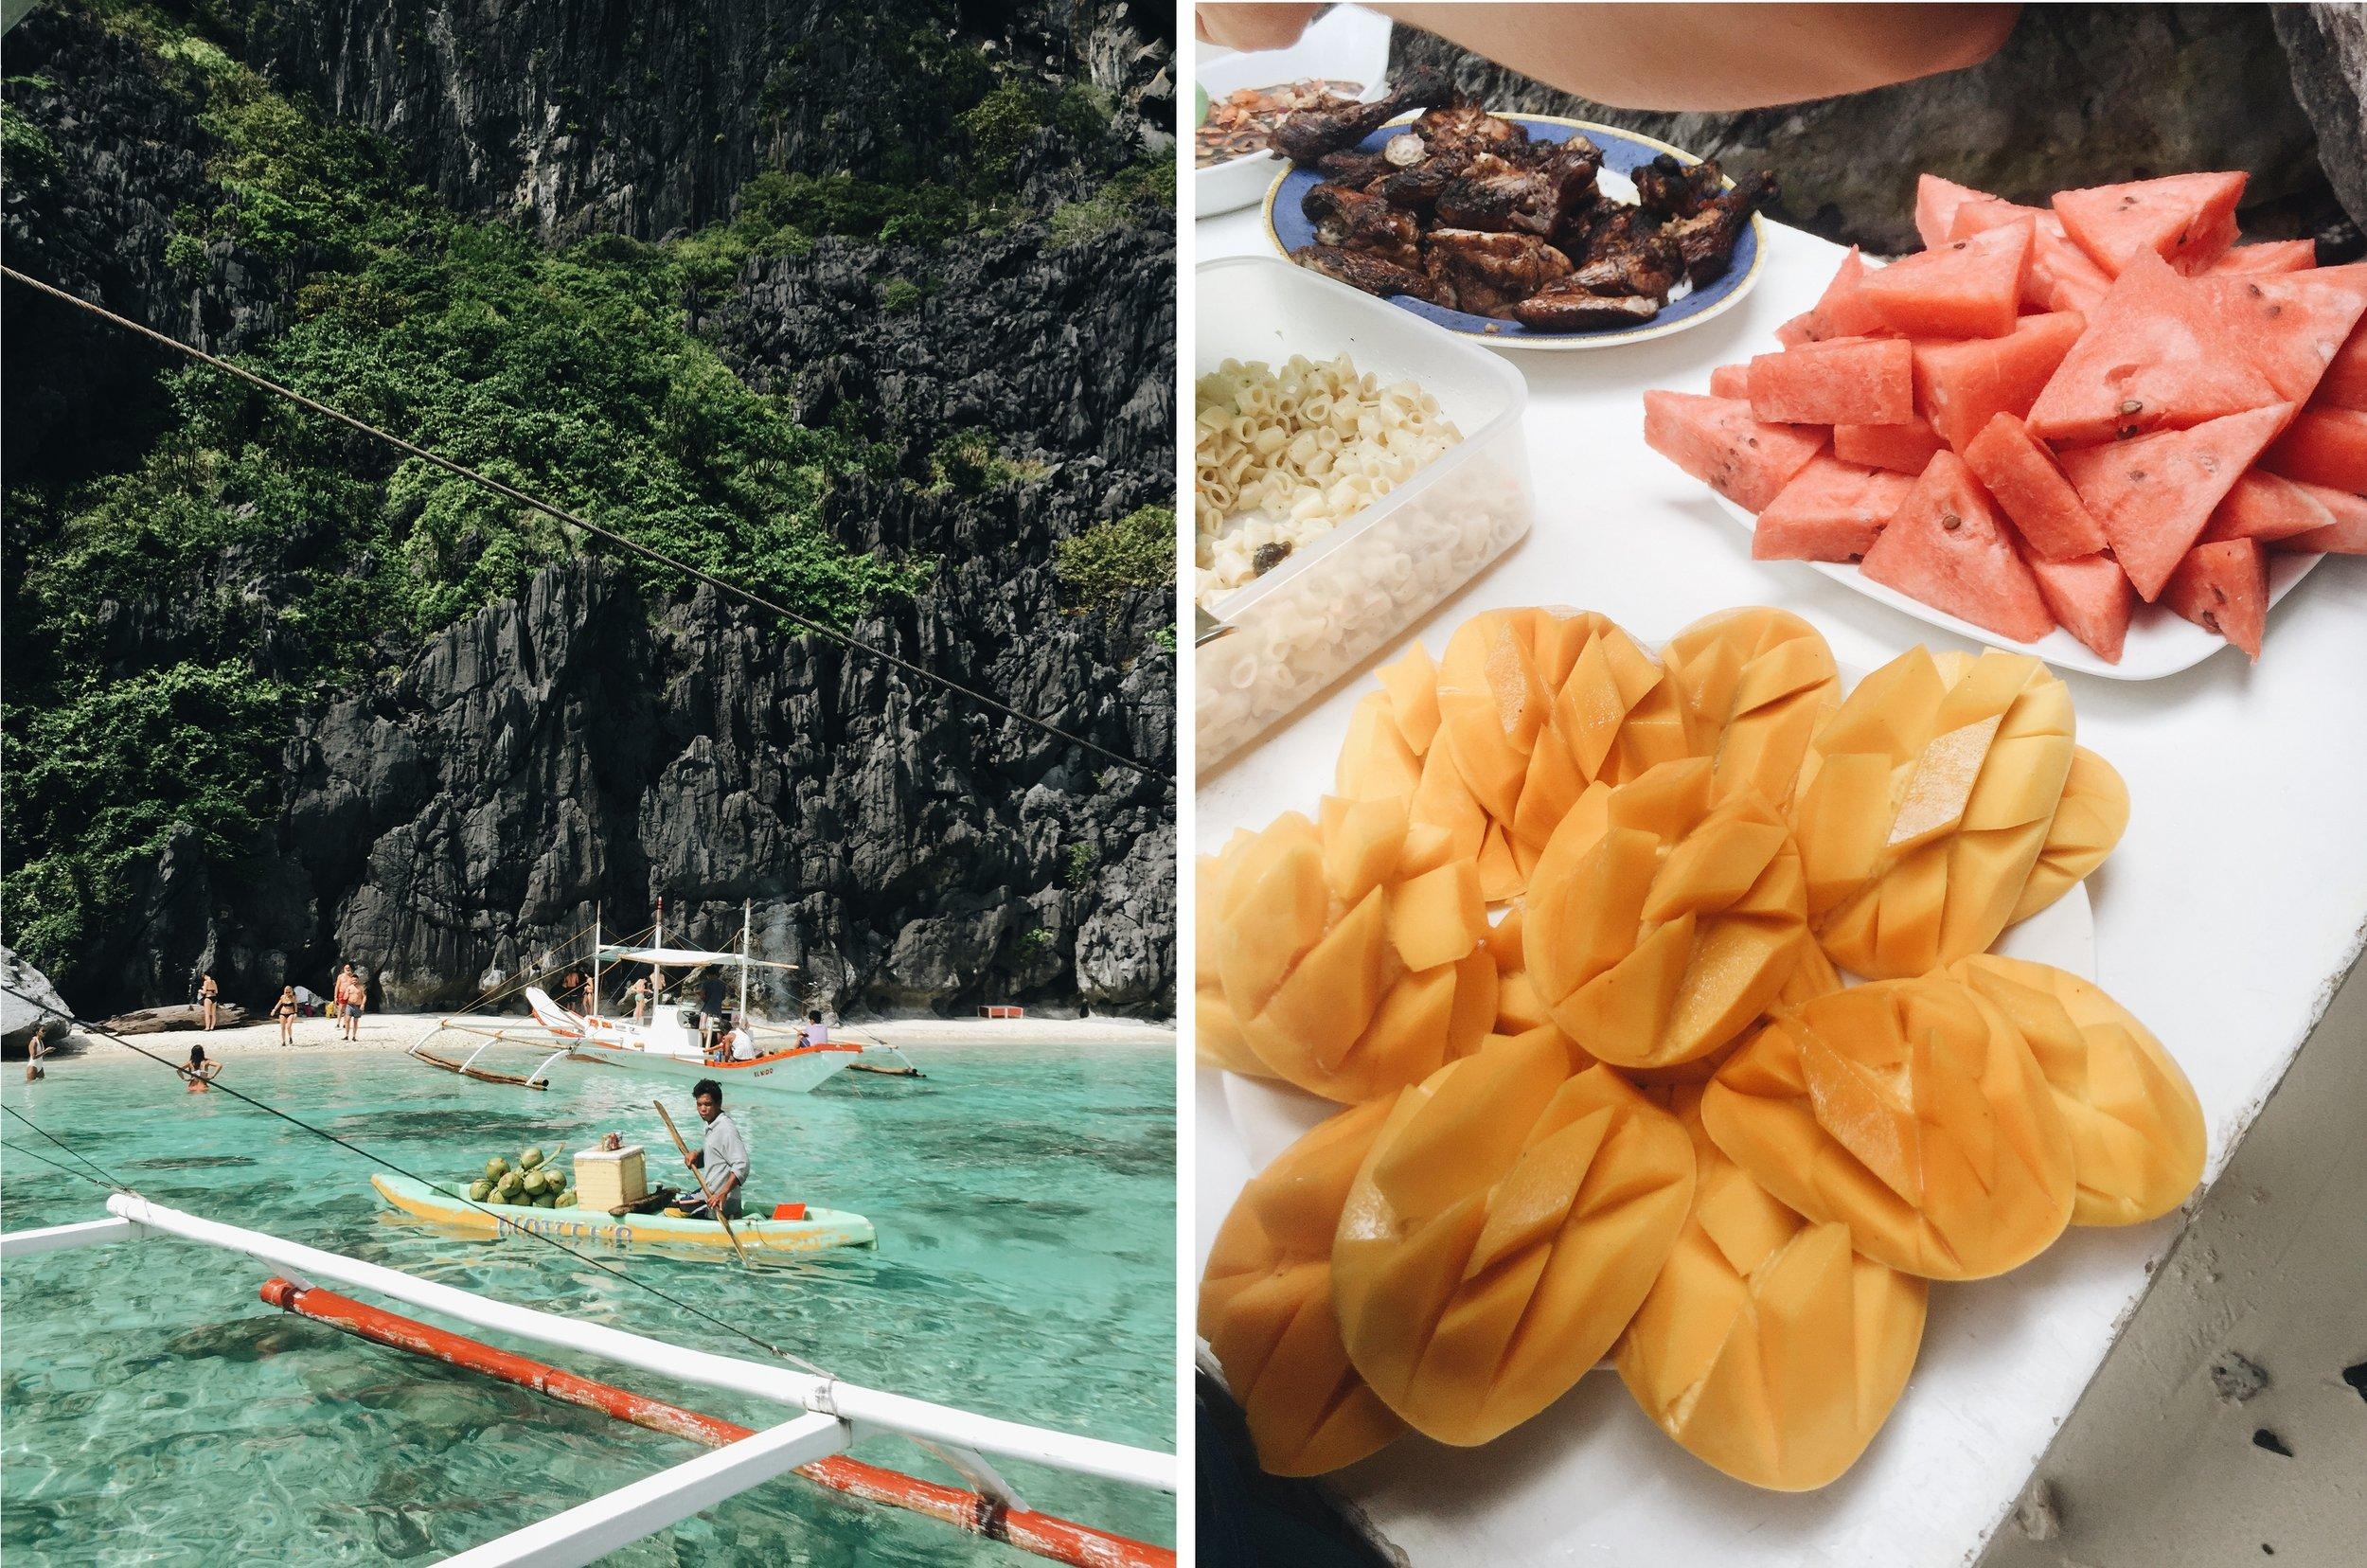 Tour-C-el-nido-philippines-travel-onmyway-blog-palawan.jpg